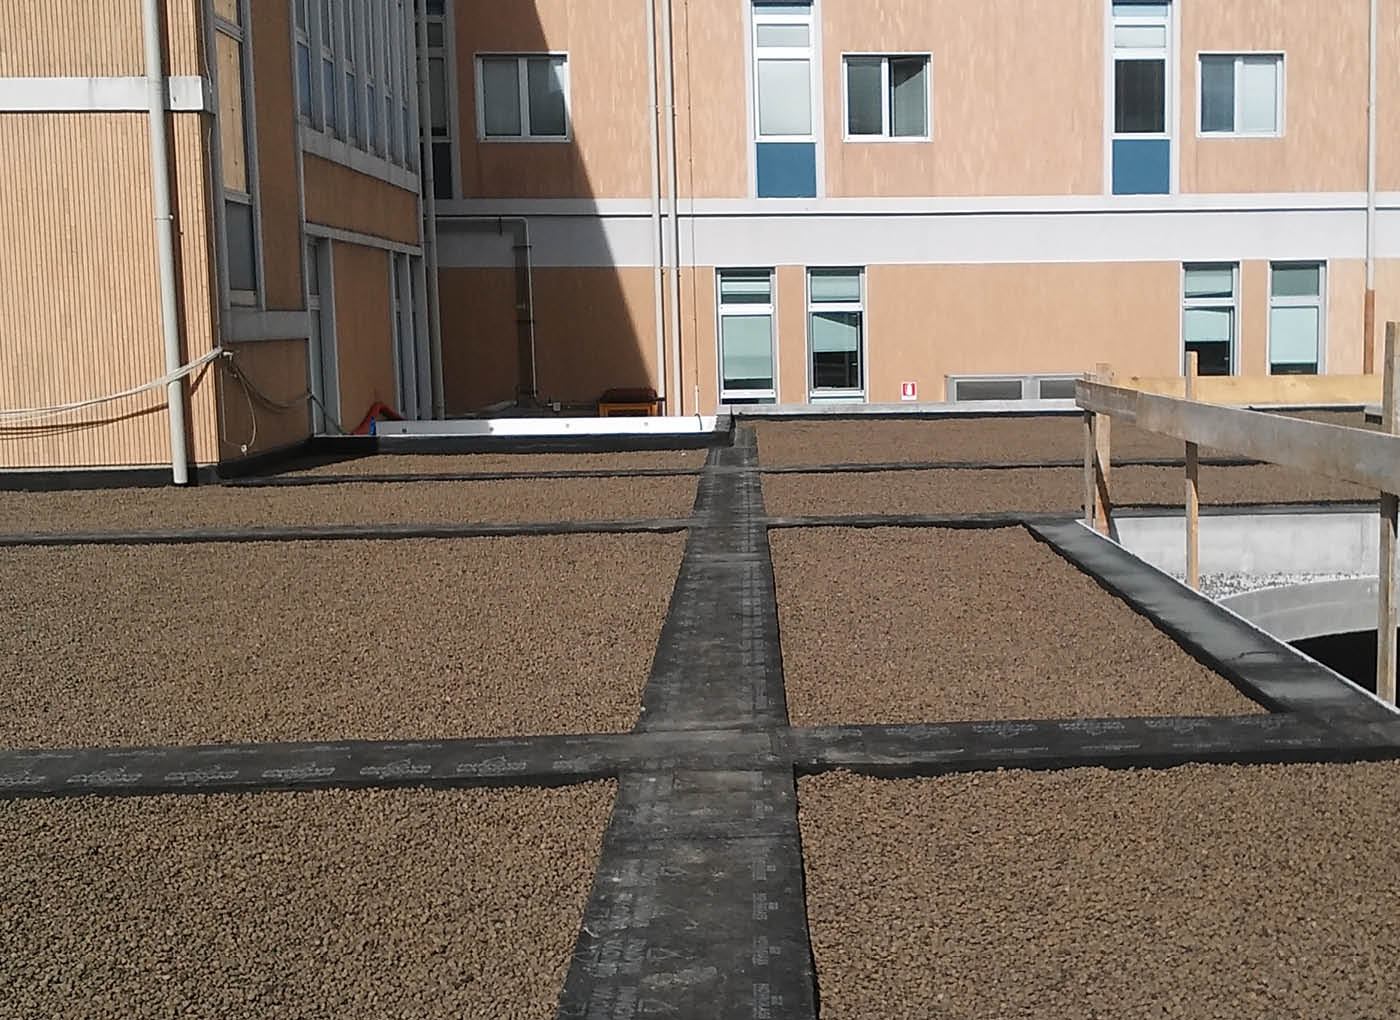 ospedale-pordenone-tetto-verde-lecagreen-5